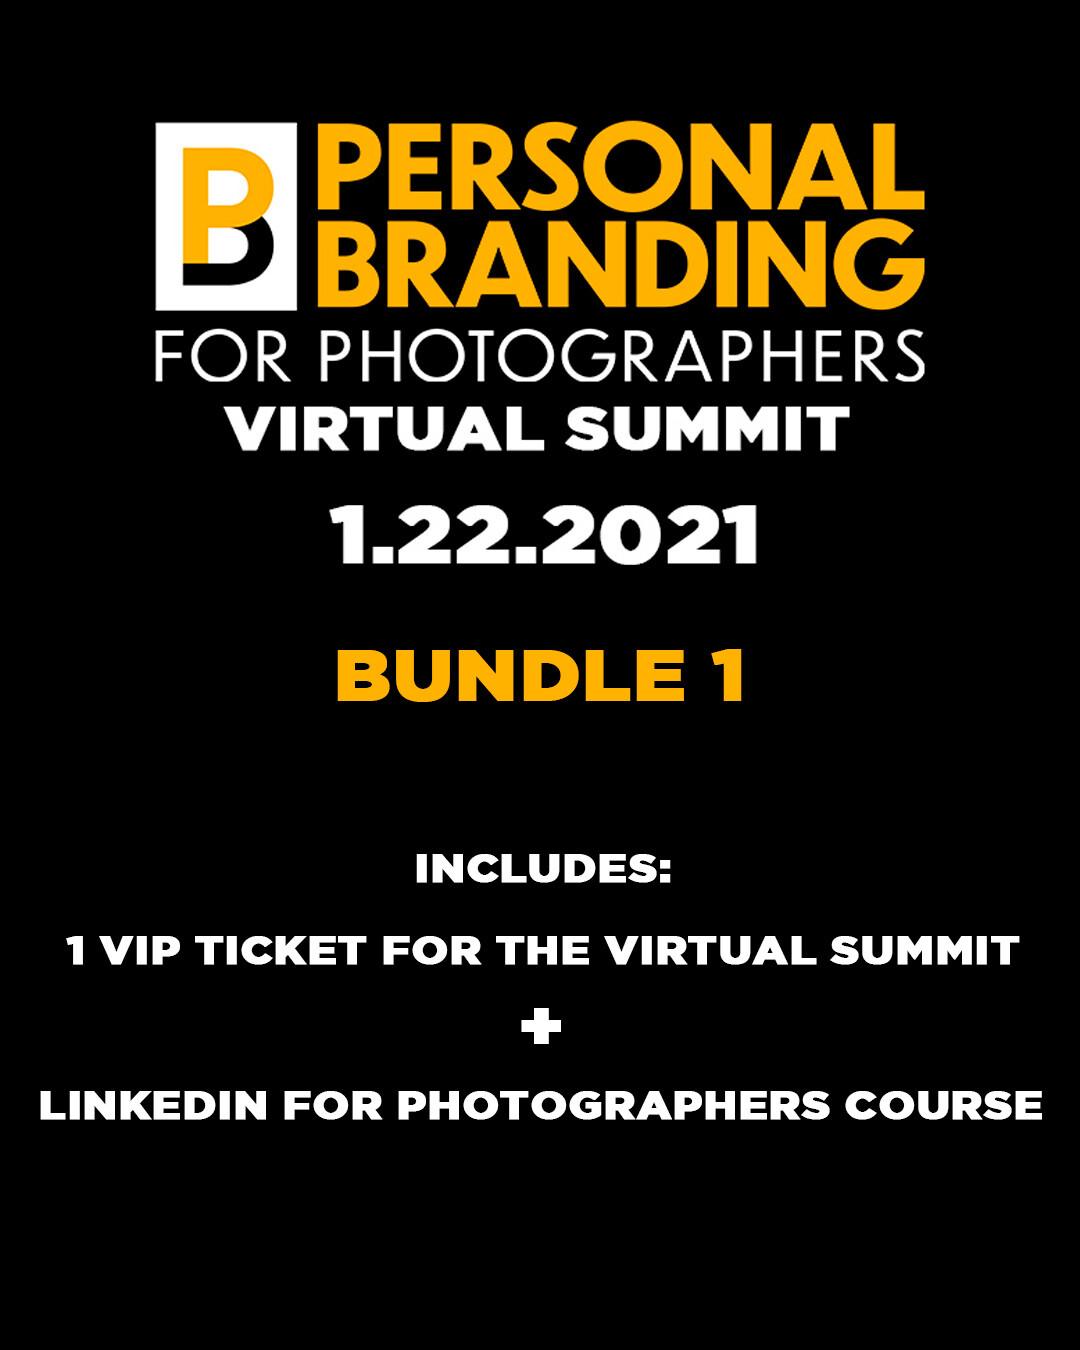 VIP Ticket + LinkedIn for Photographers bundle